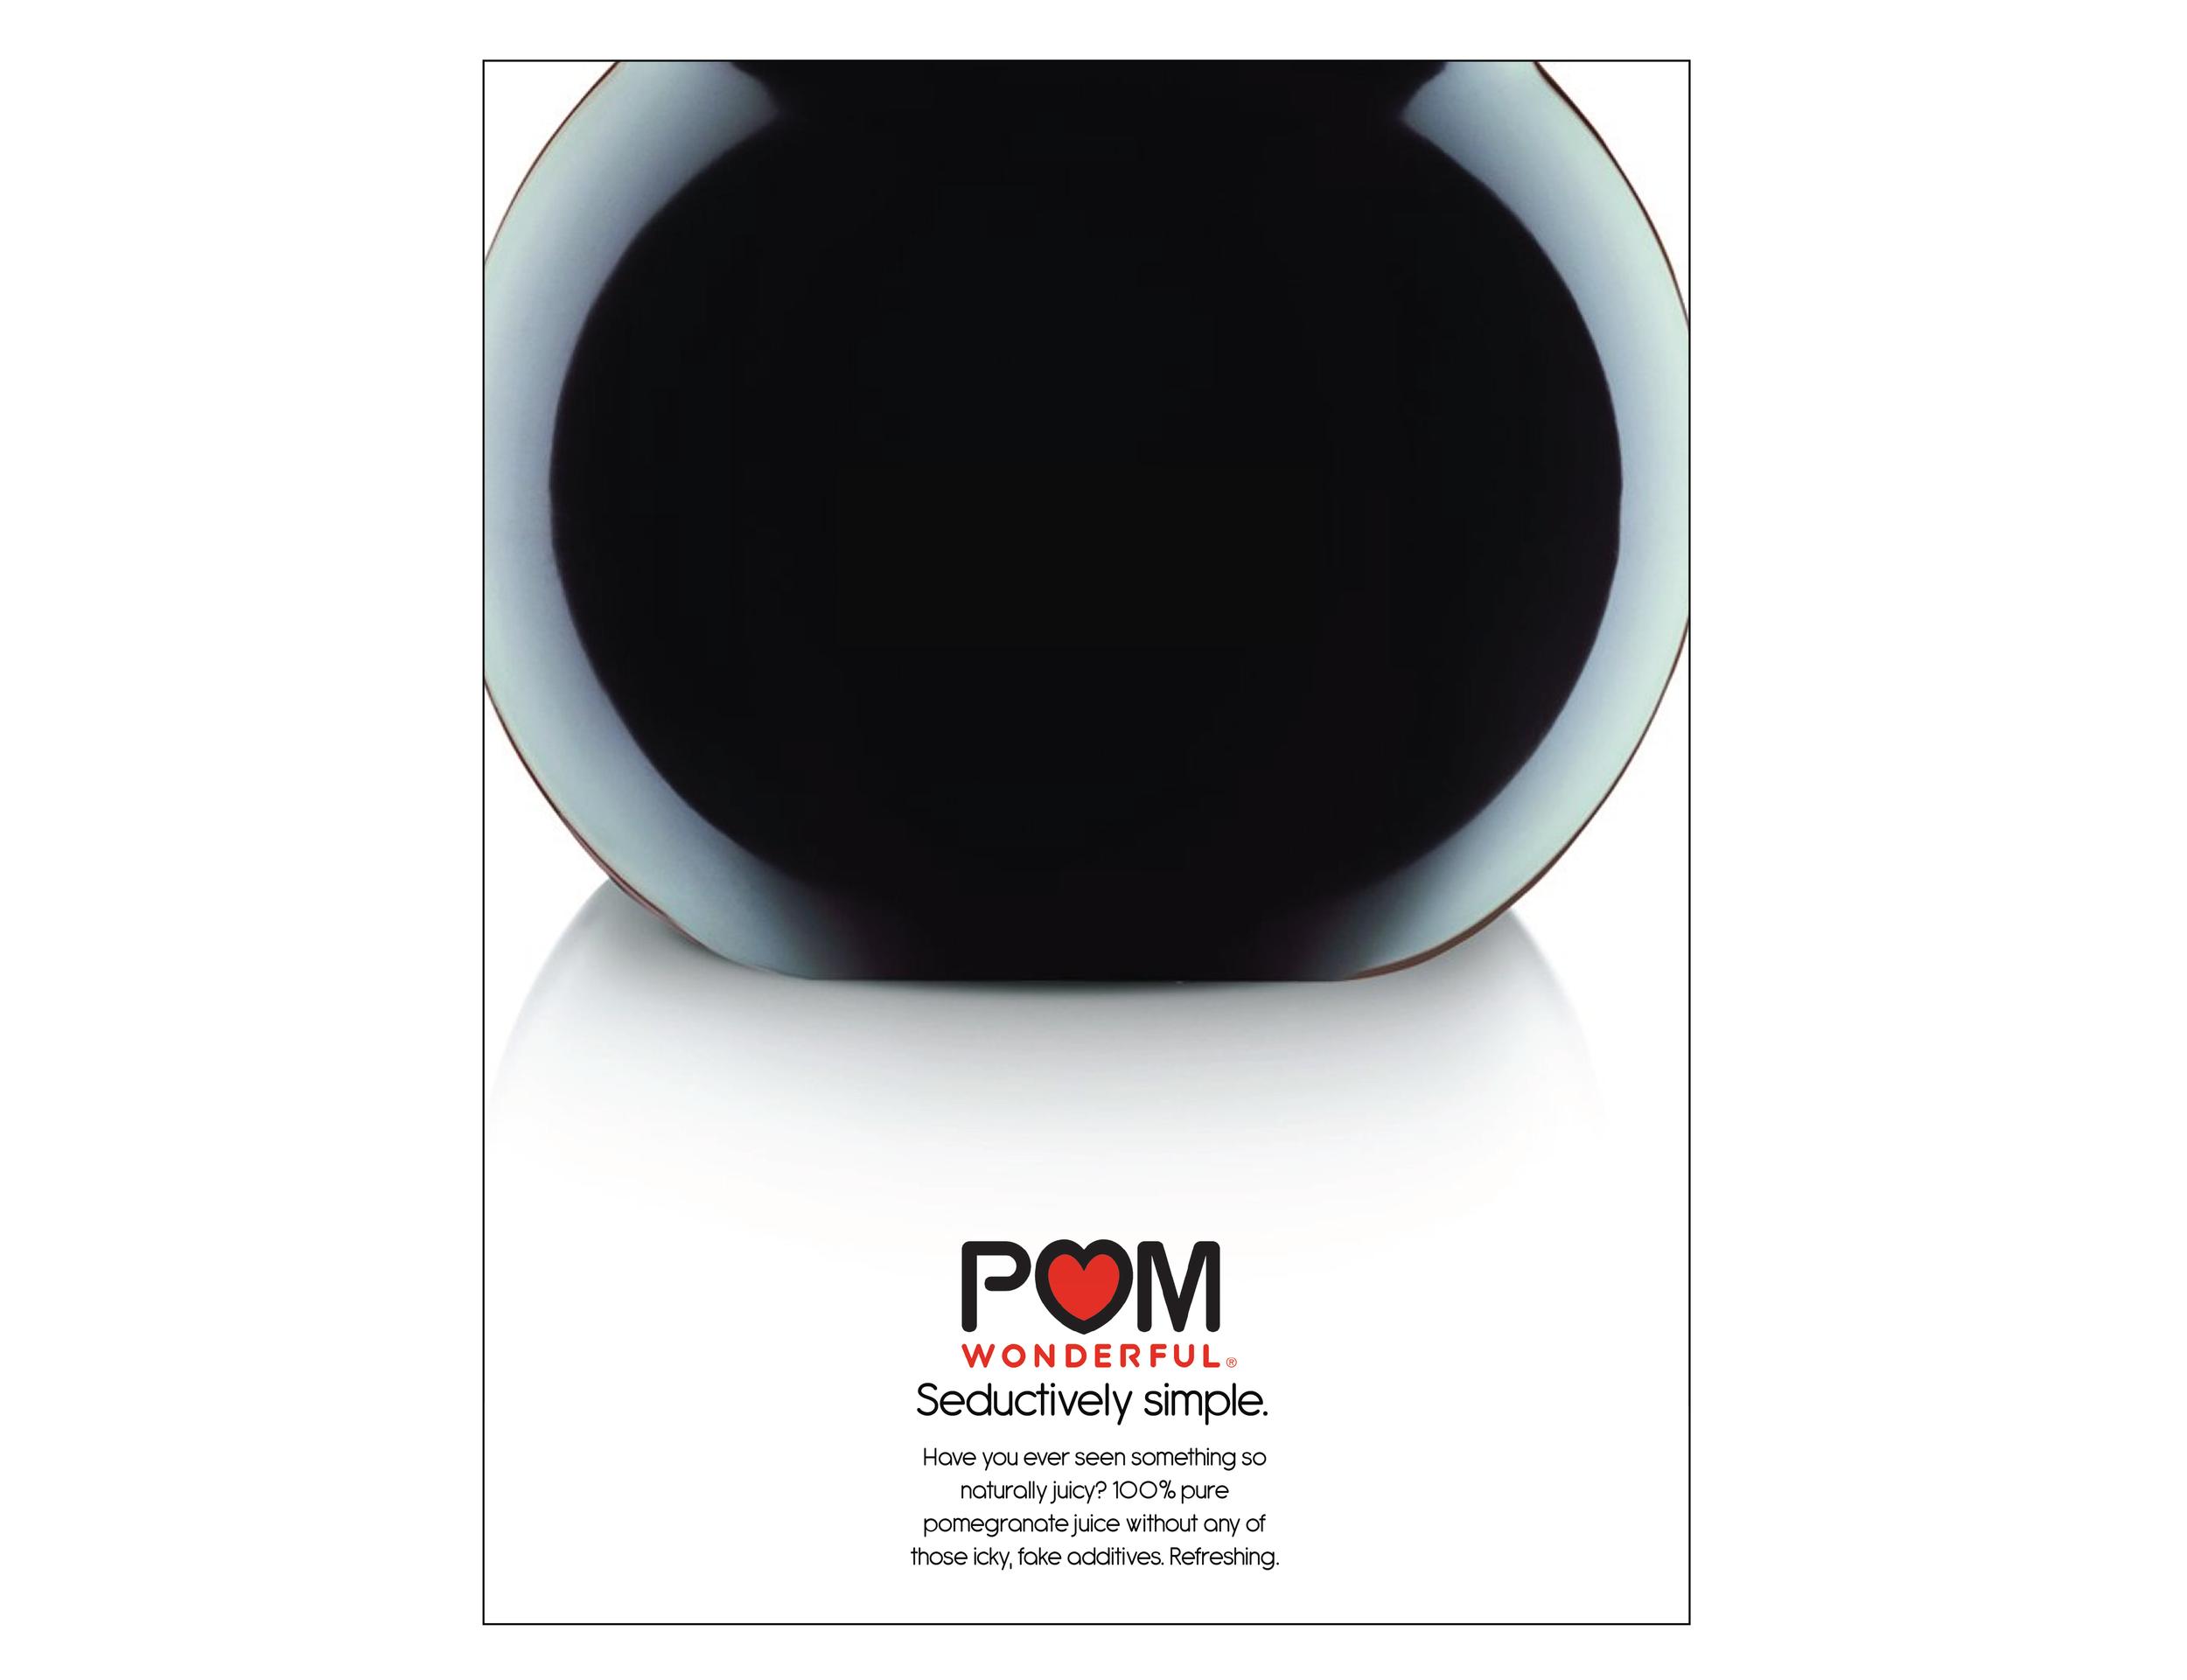 pom_ads_-03.png